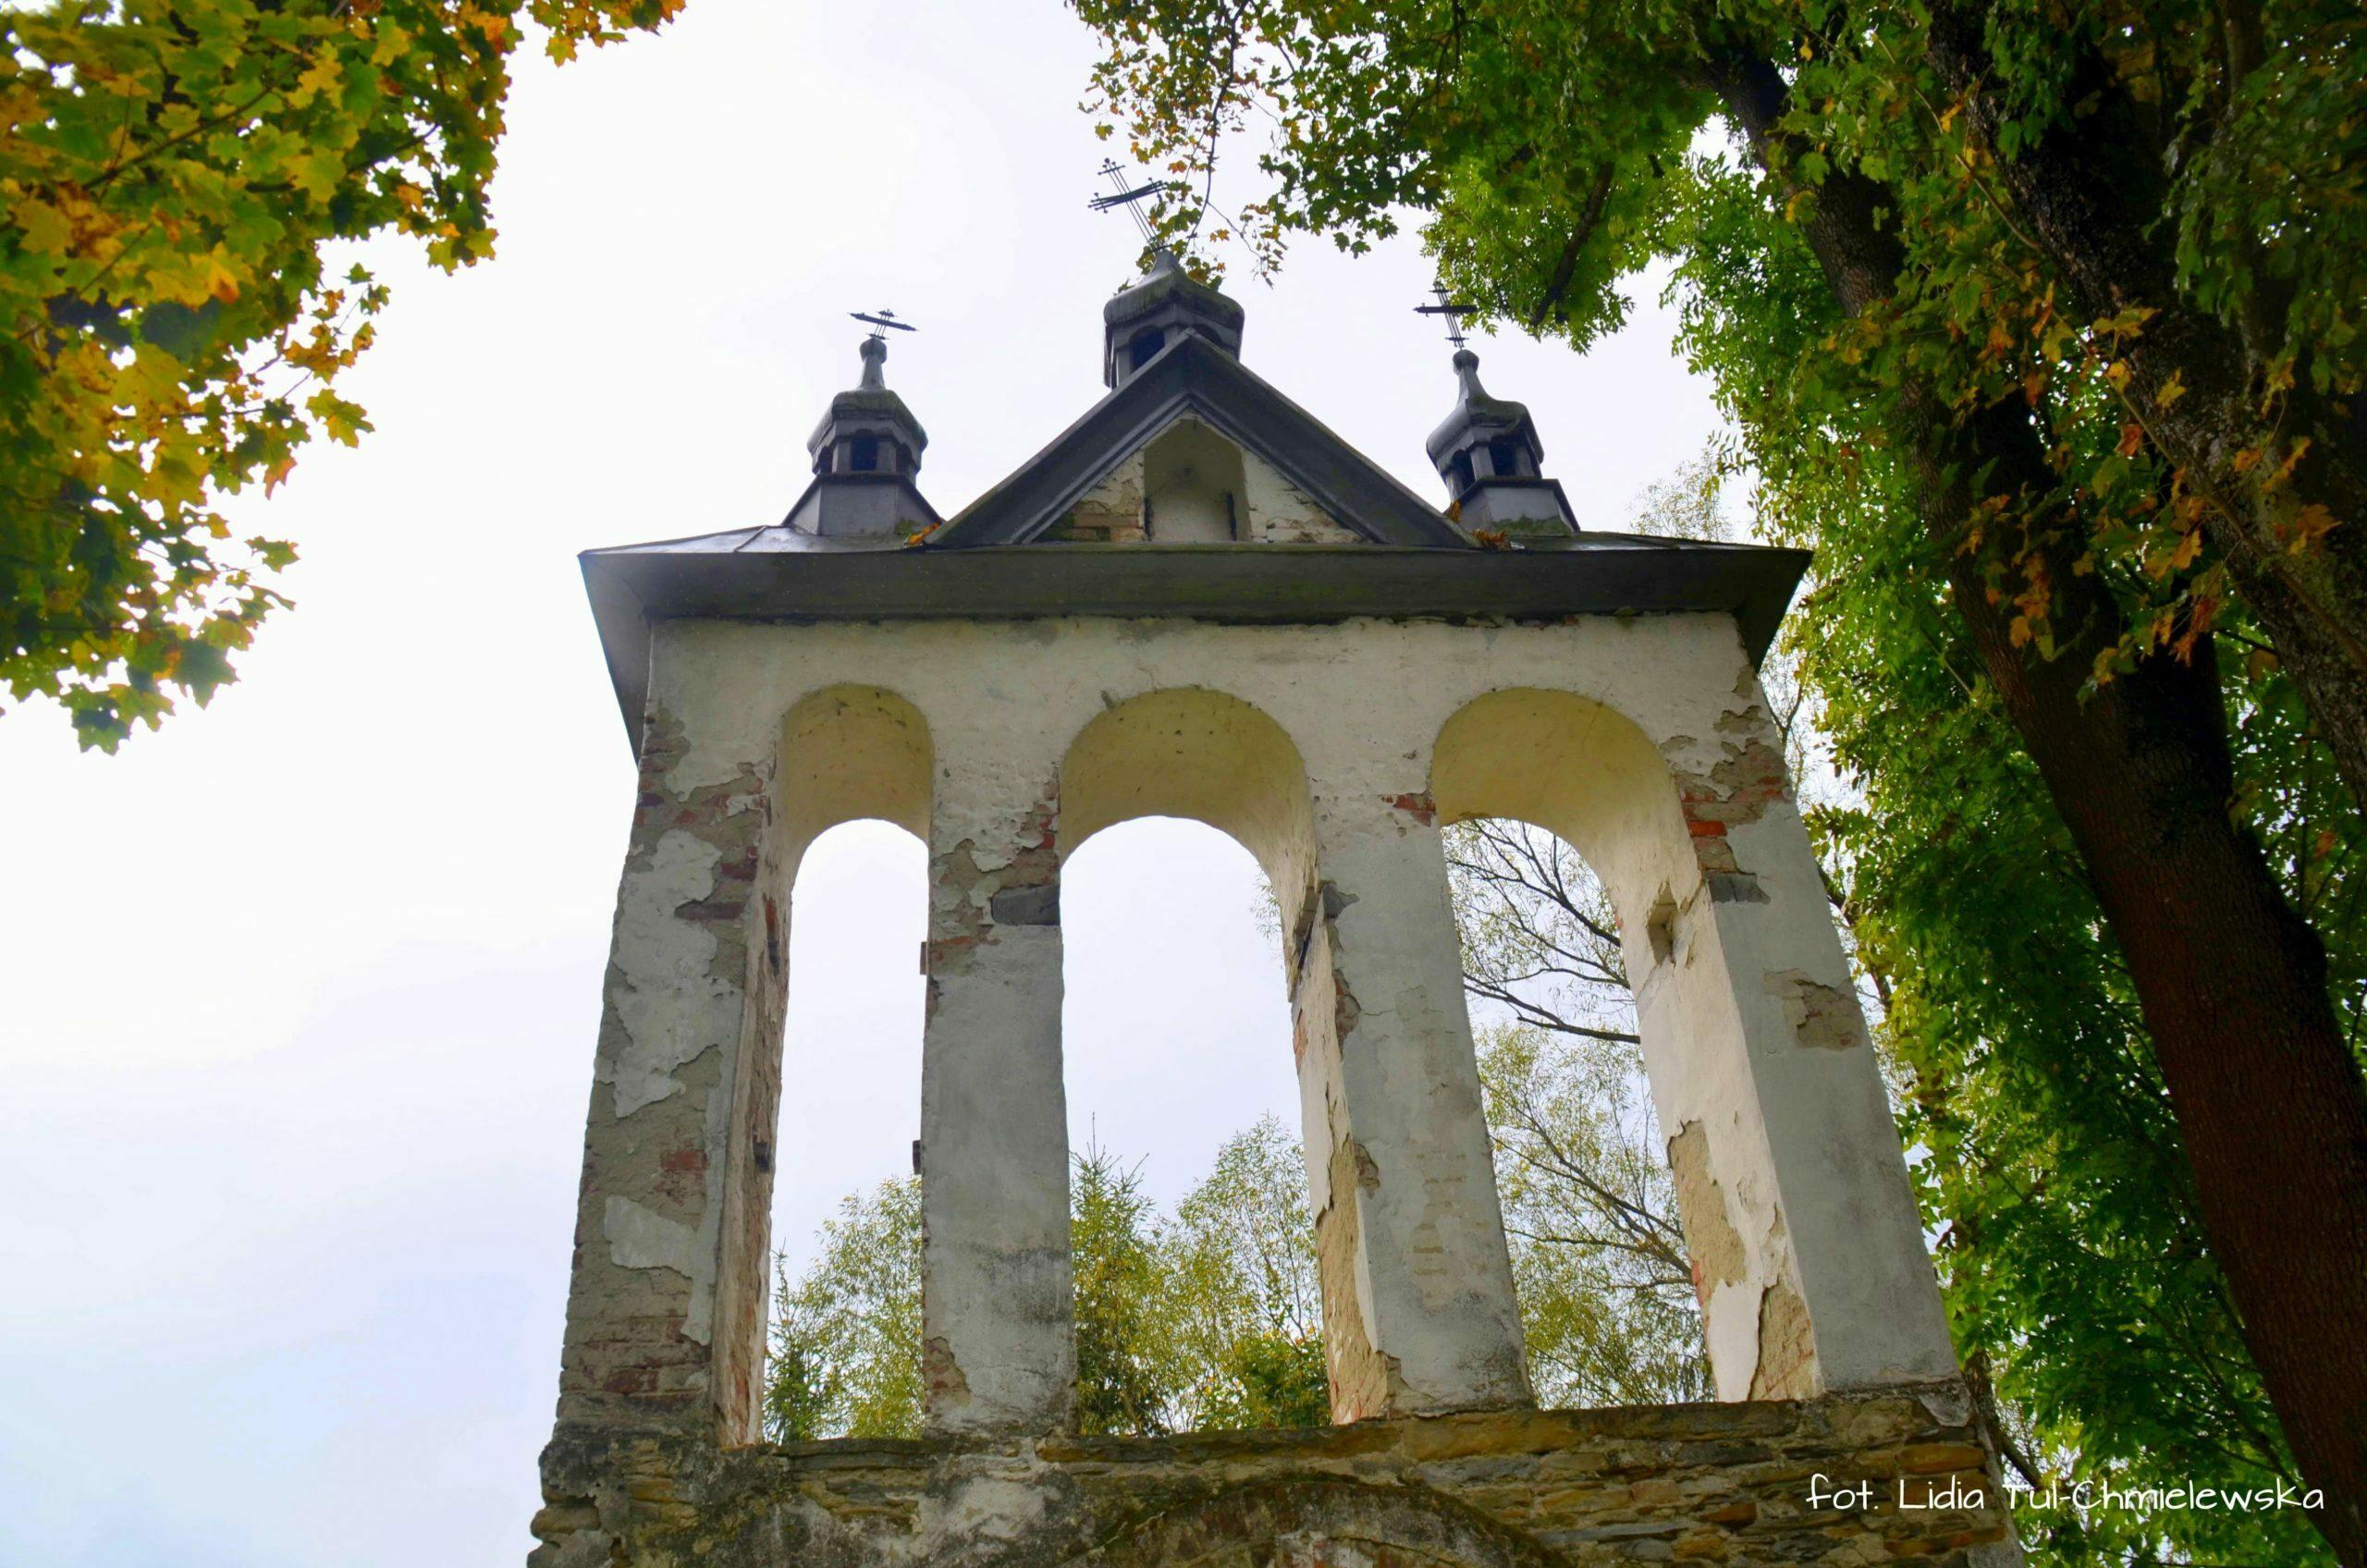 Dzwonnica, Liskowate / fot. Lidia Tul-Chmielewska